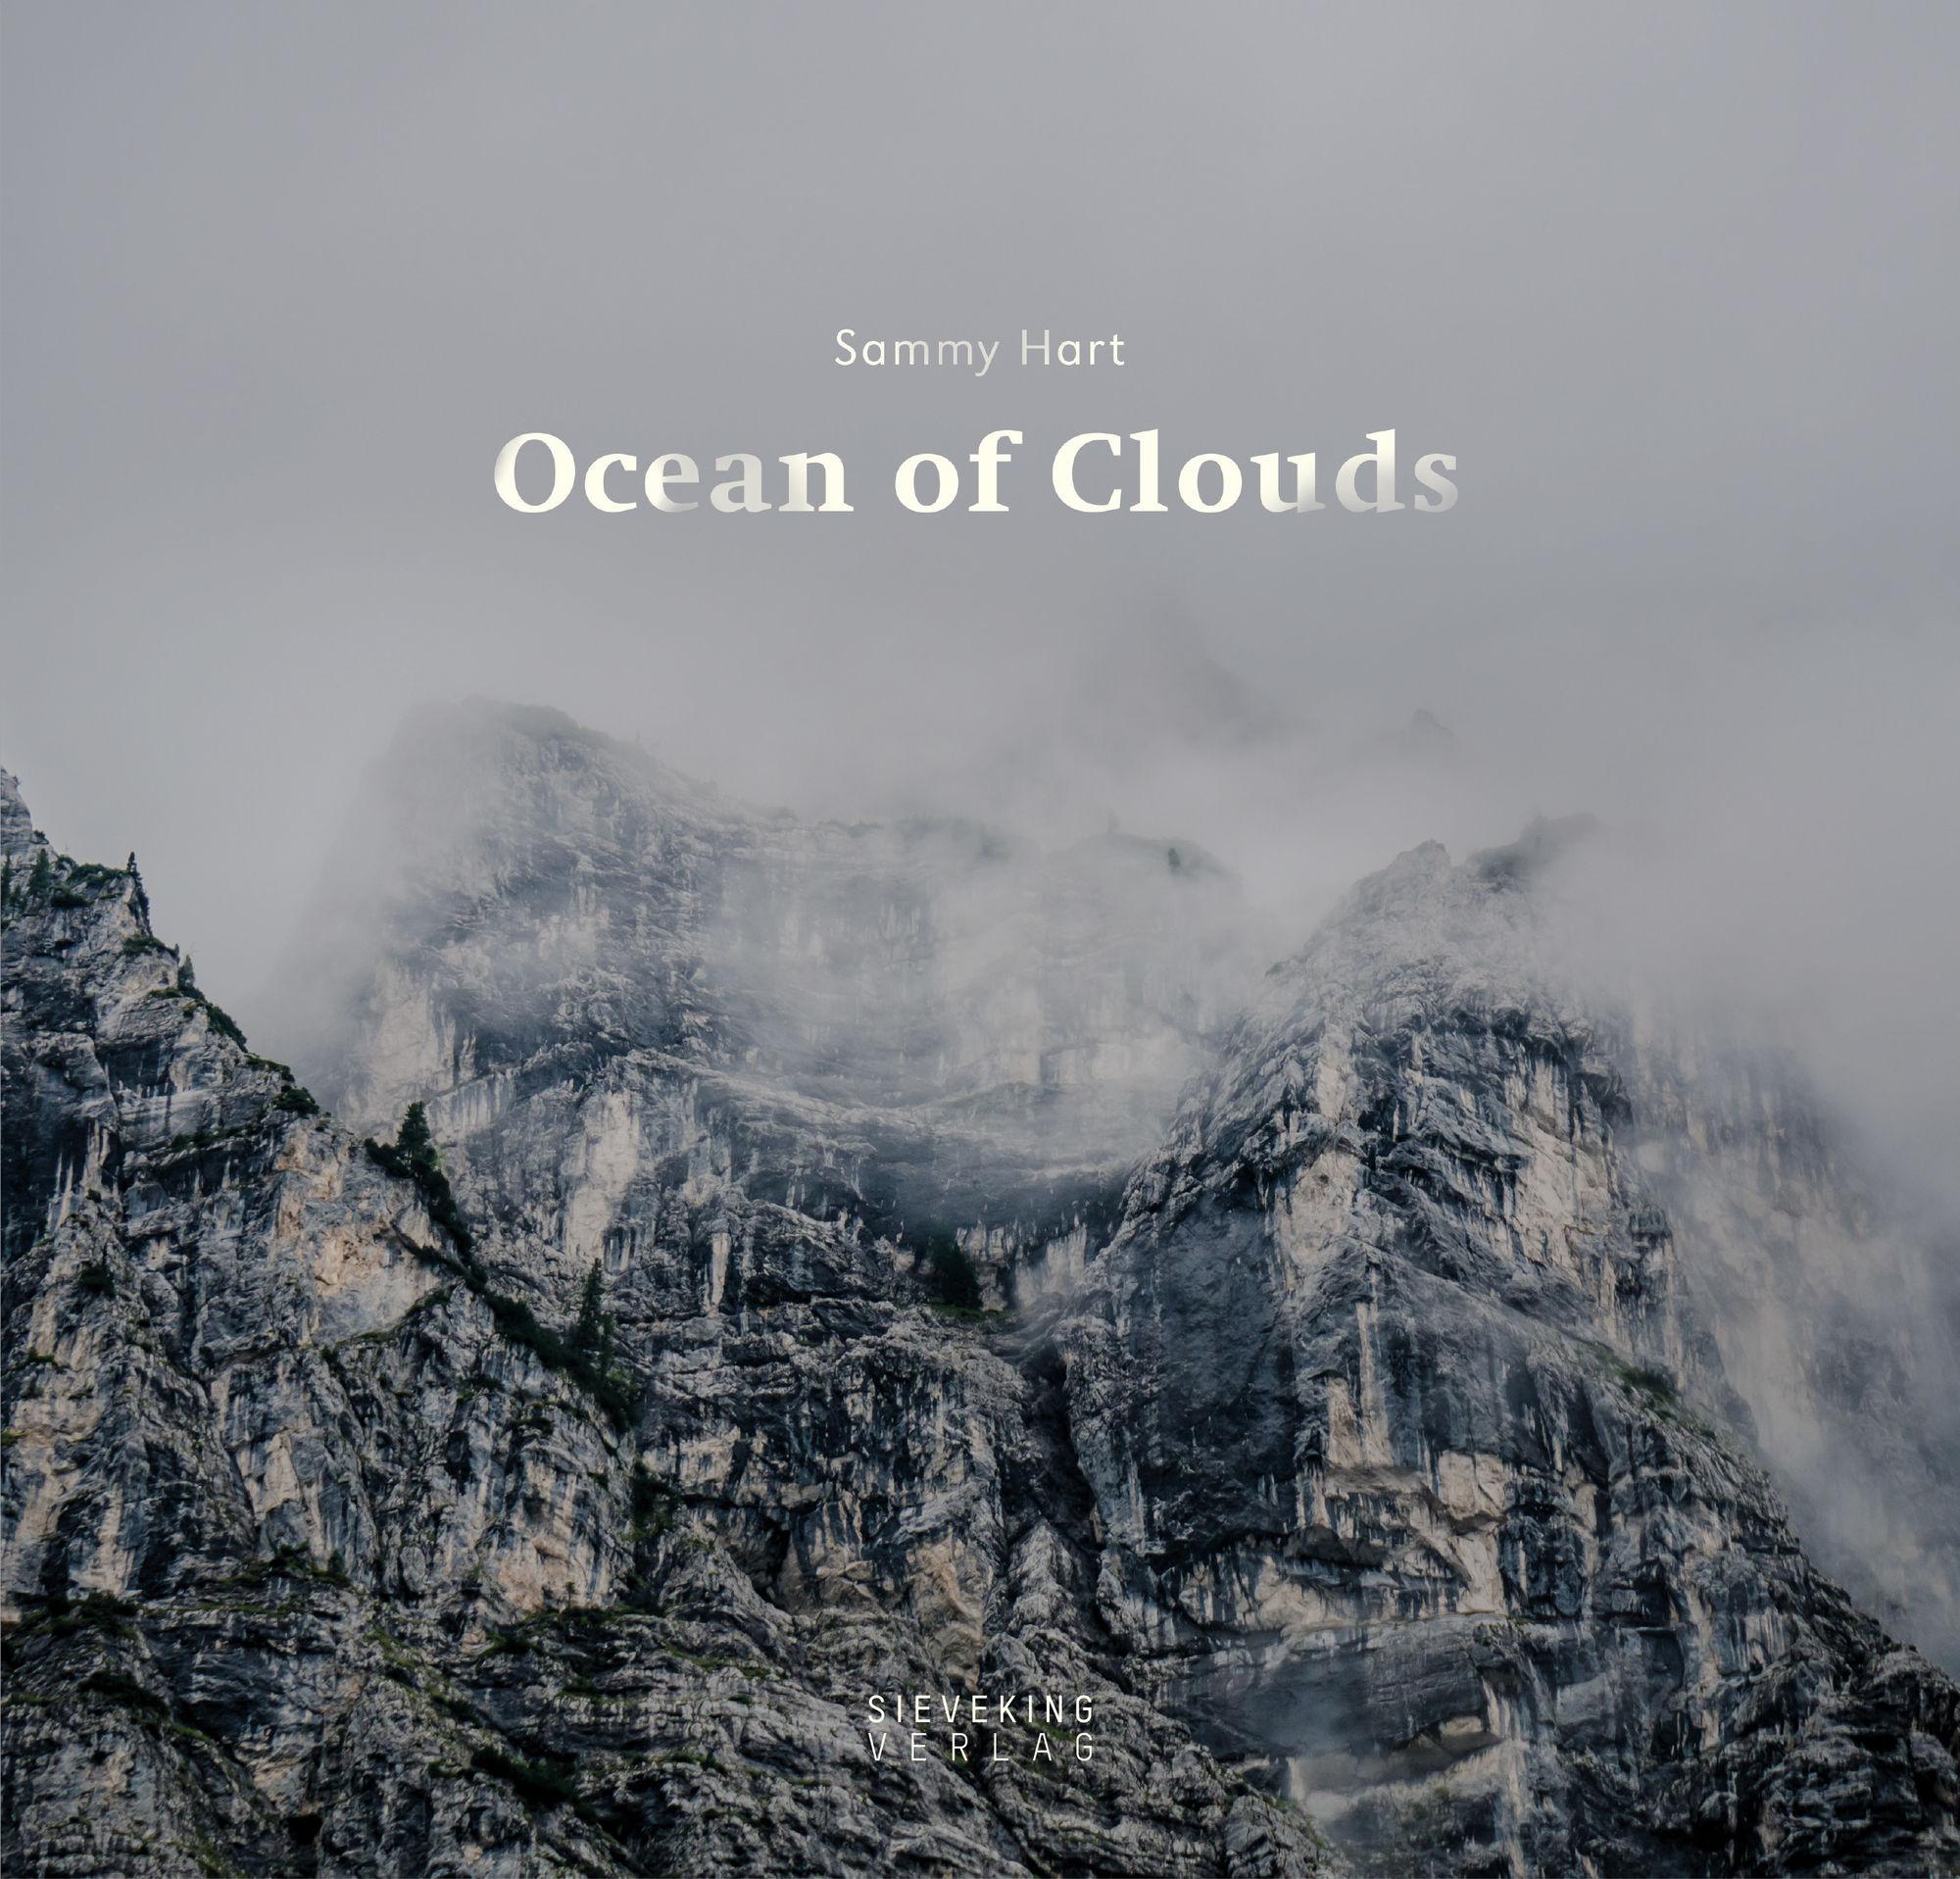 'Ocean of Clouds' by Samy Heart (Sieveking Verlag)